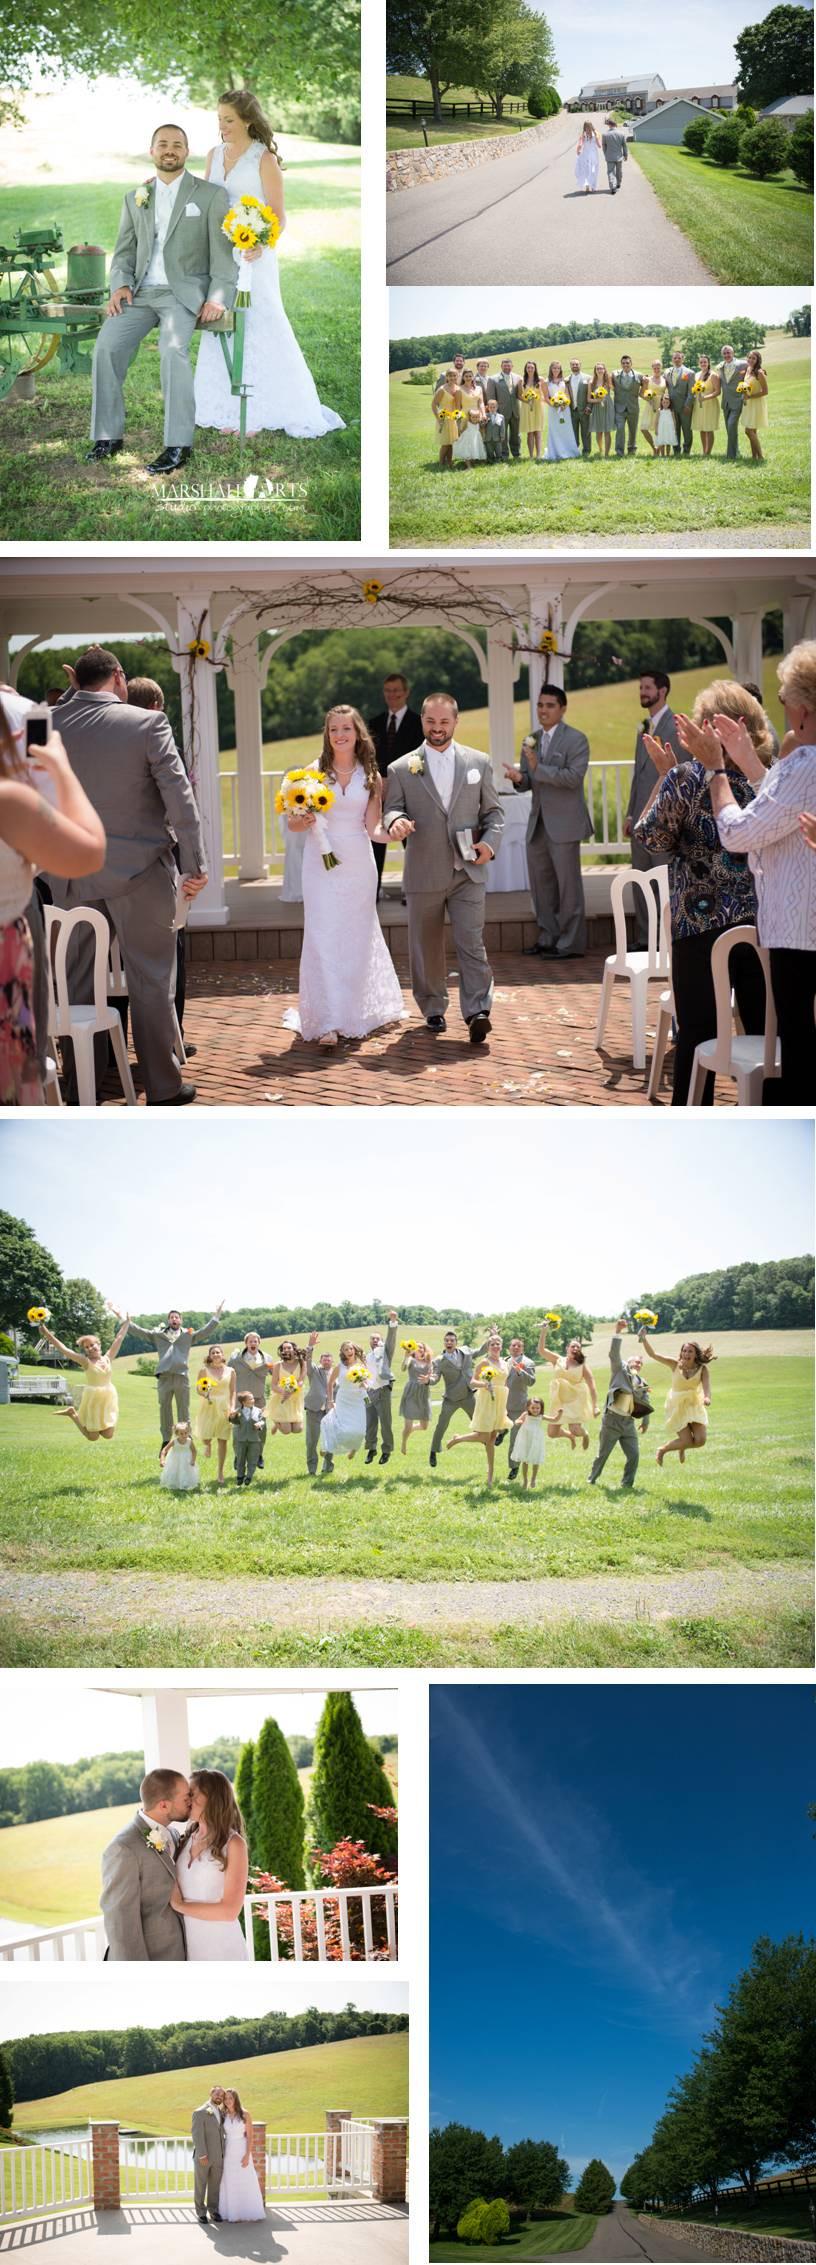 jenna wedding 1